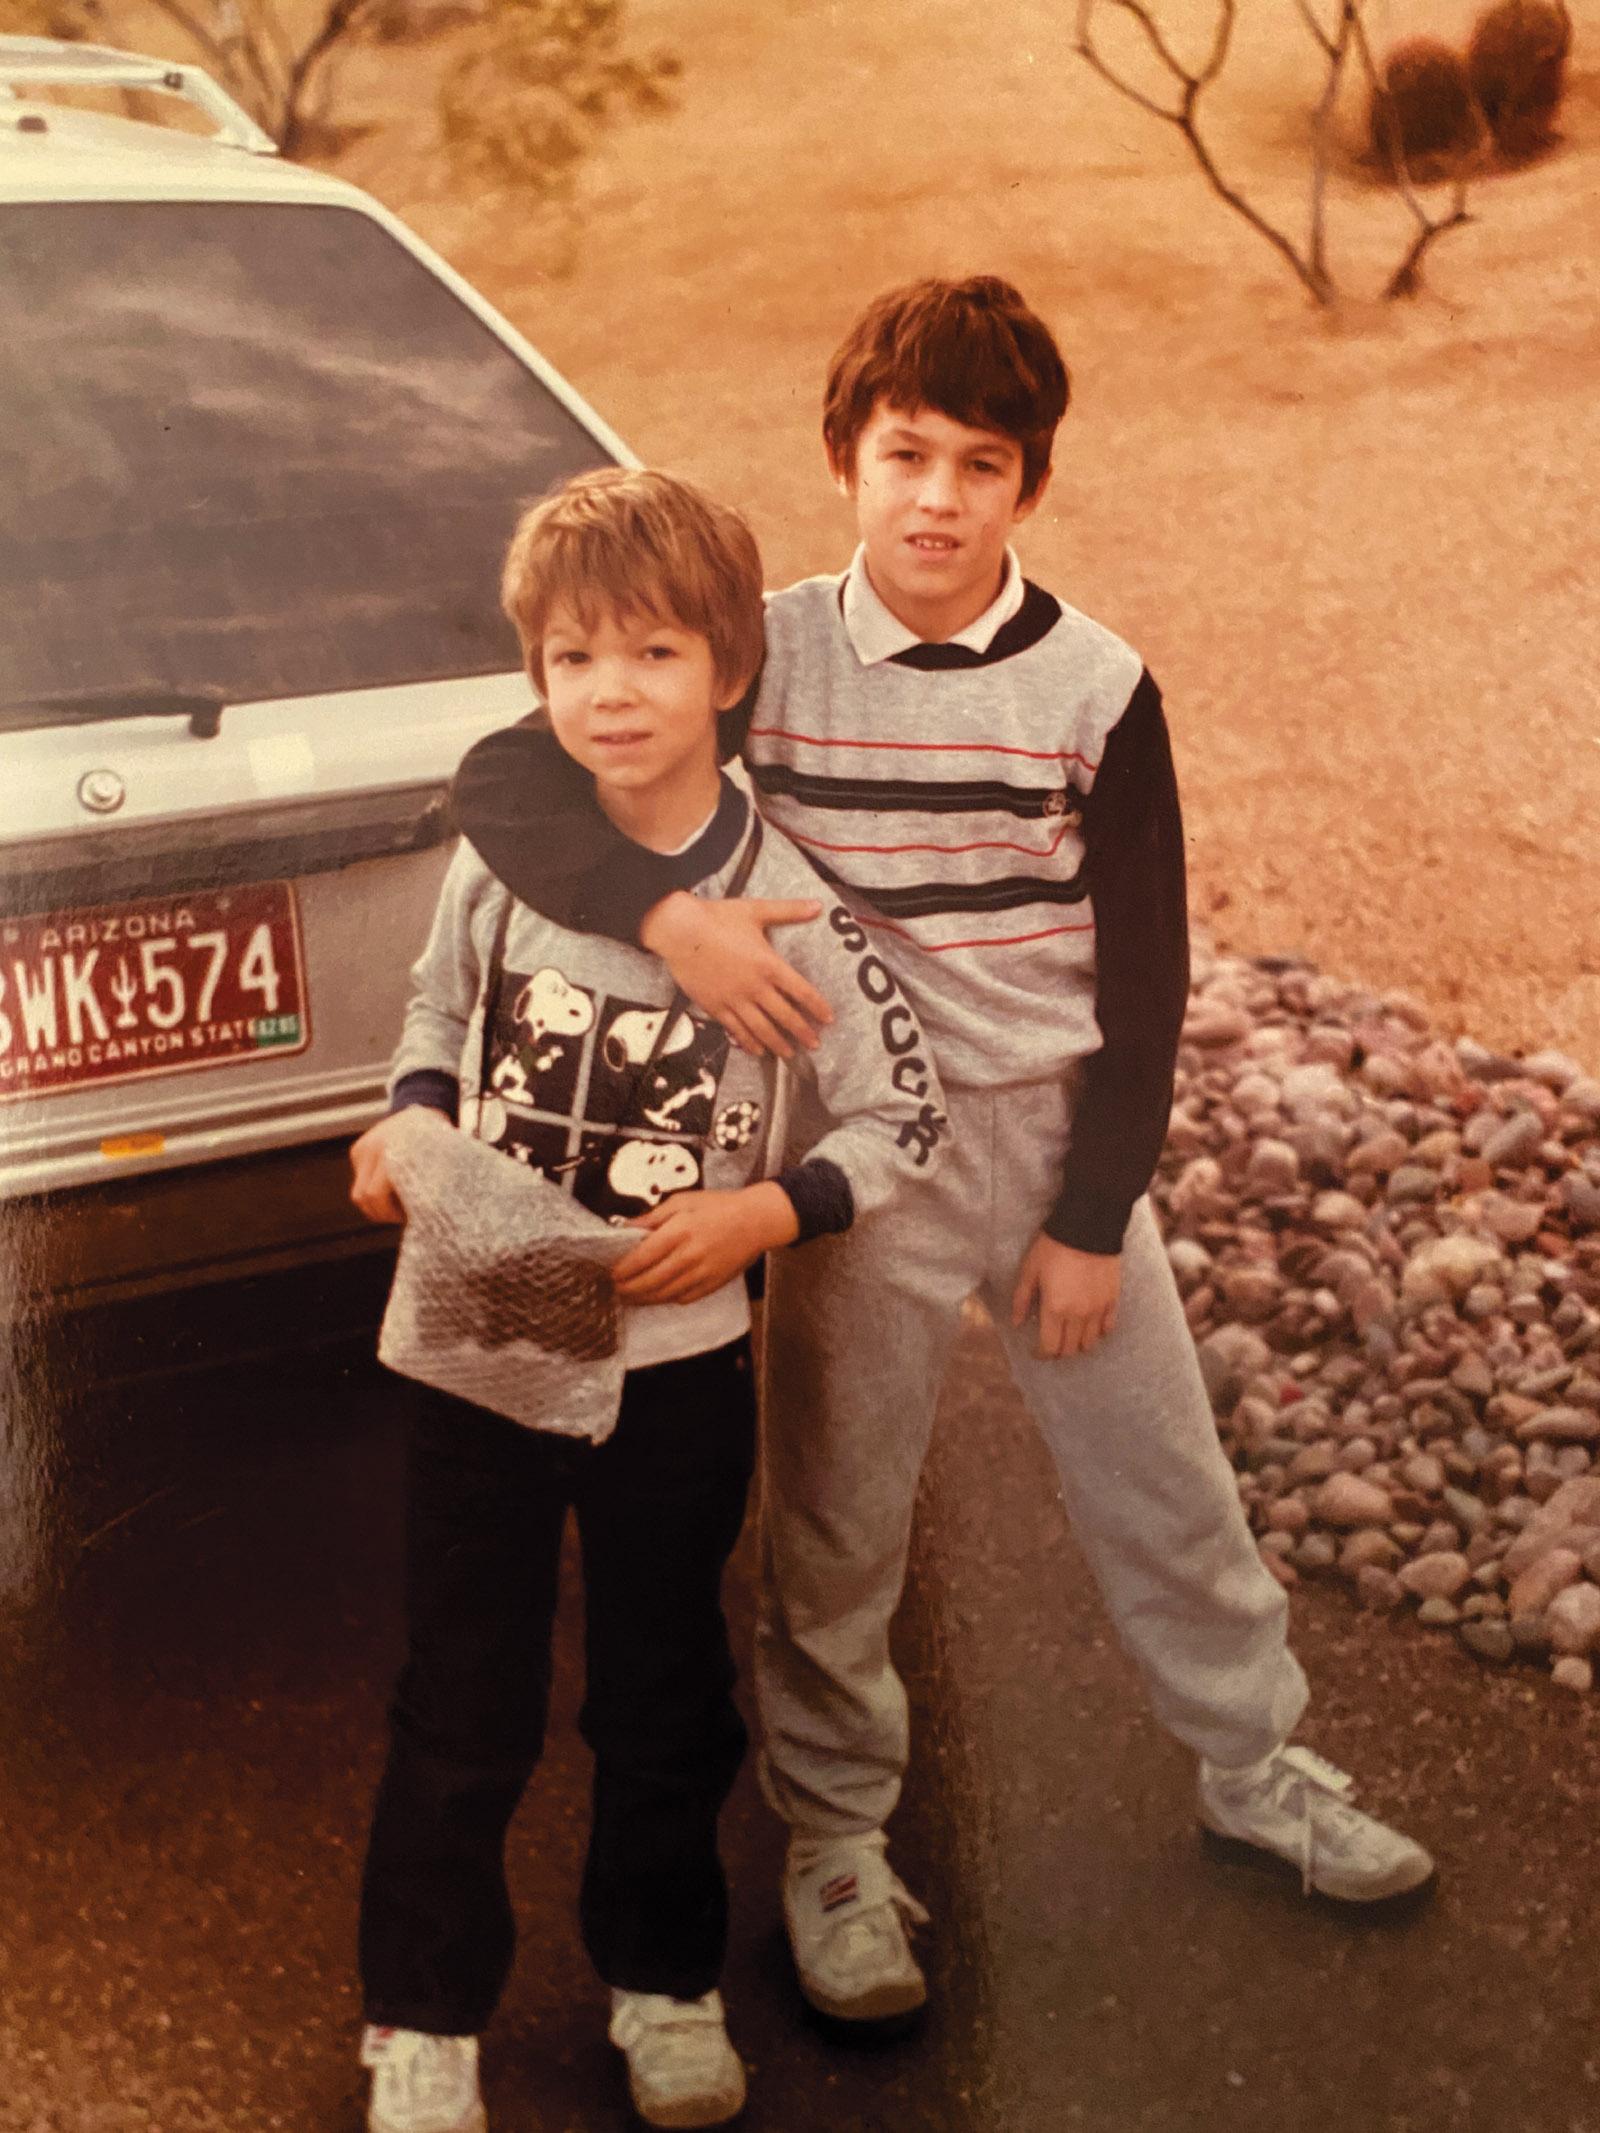 Ben Lerner and his brother, Matt, Phoenix, Arizona, 1985